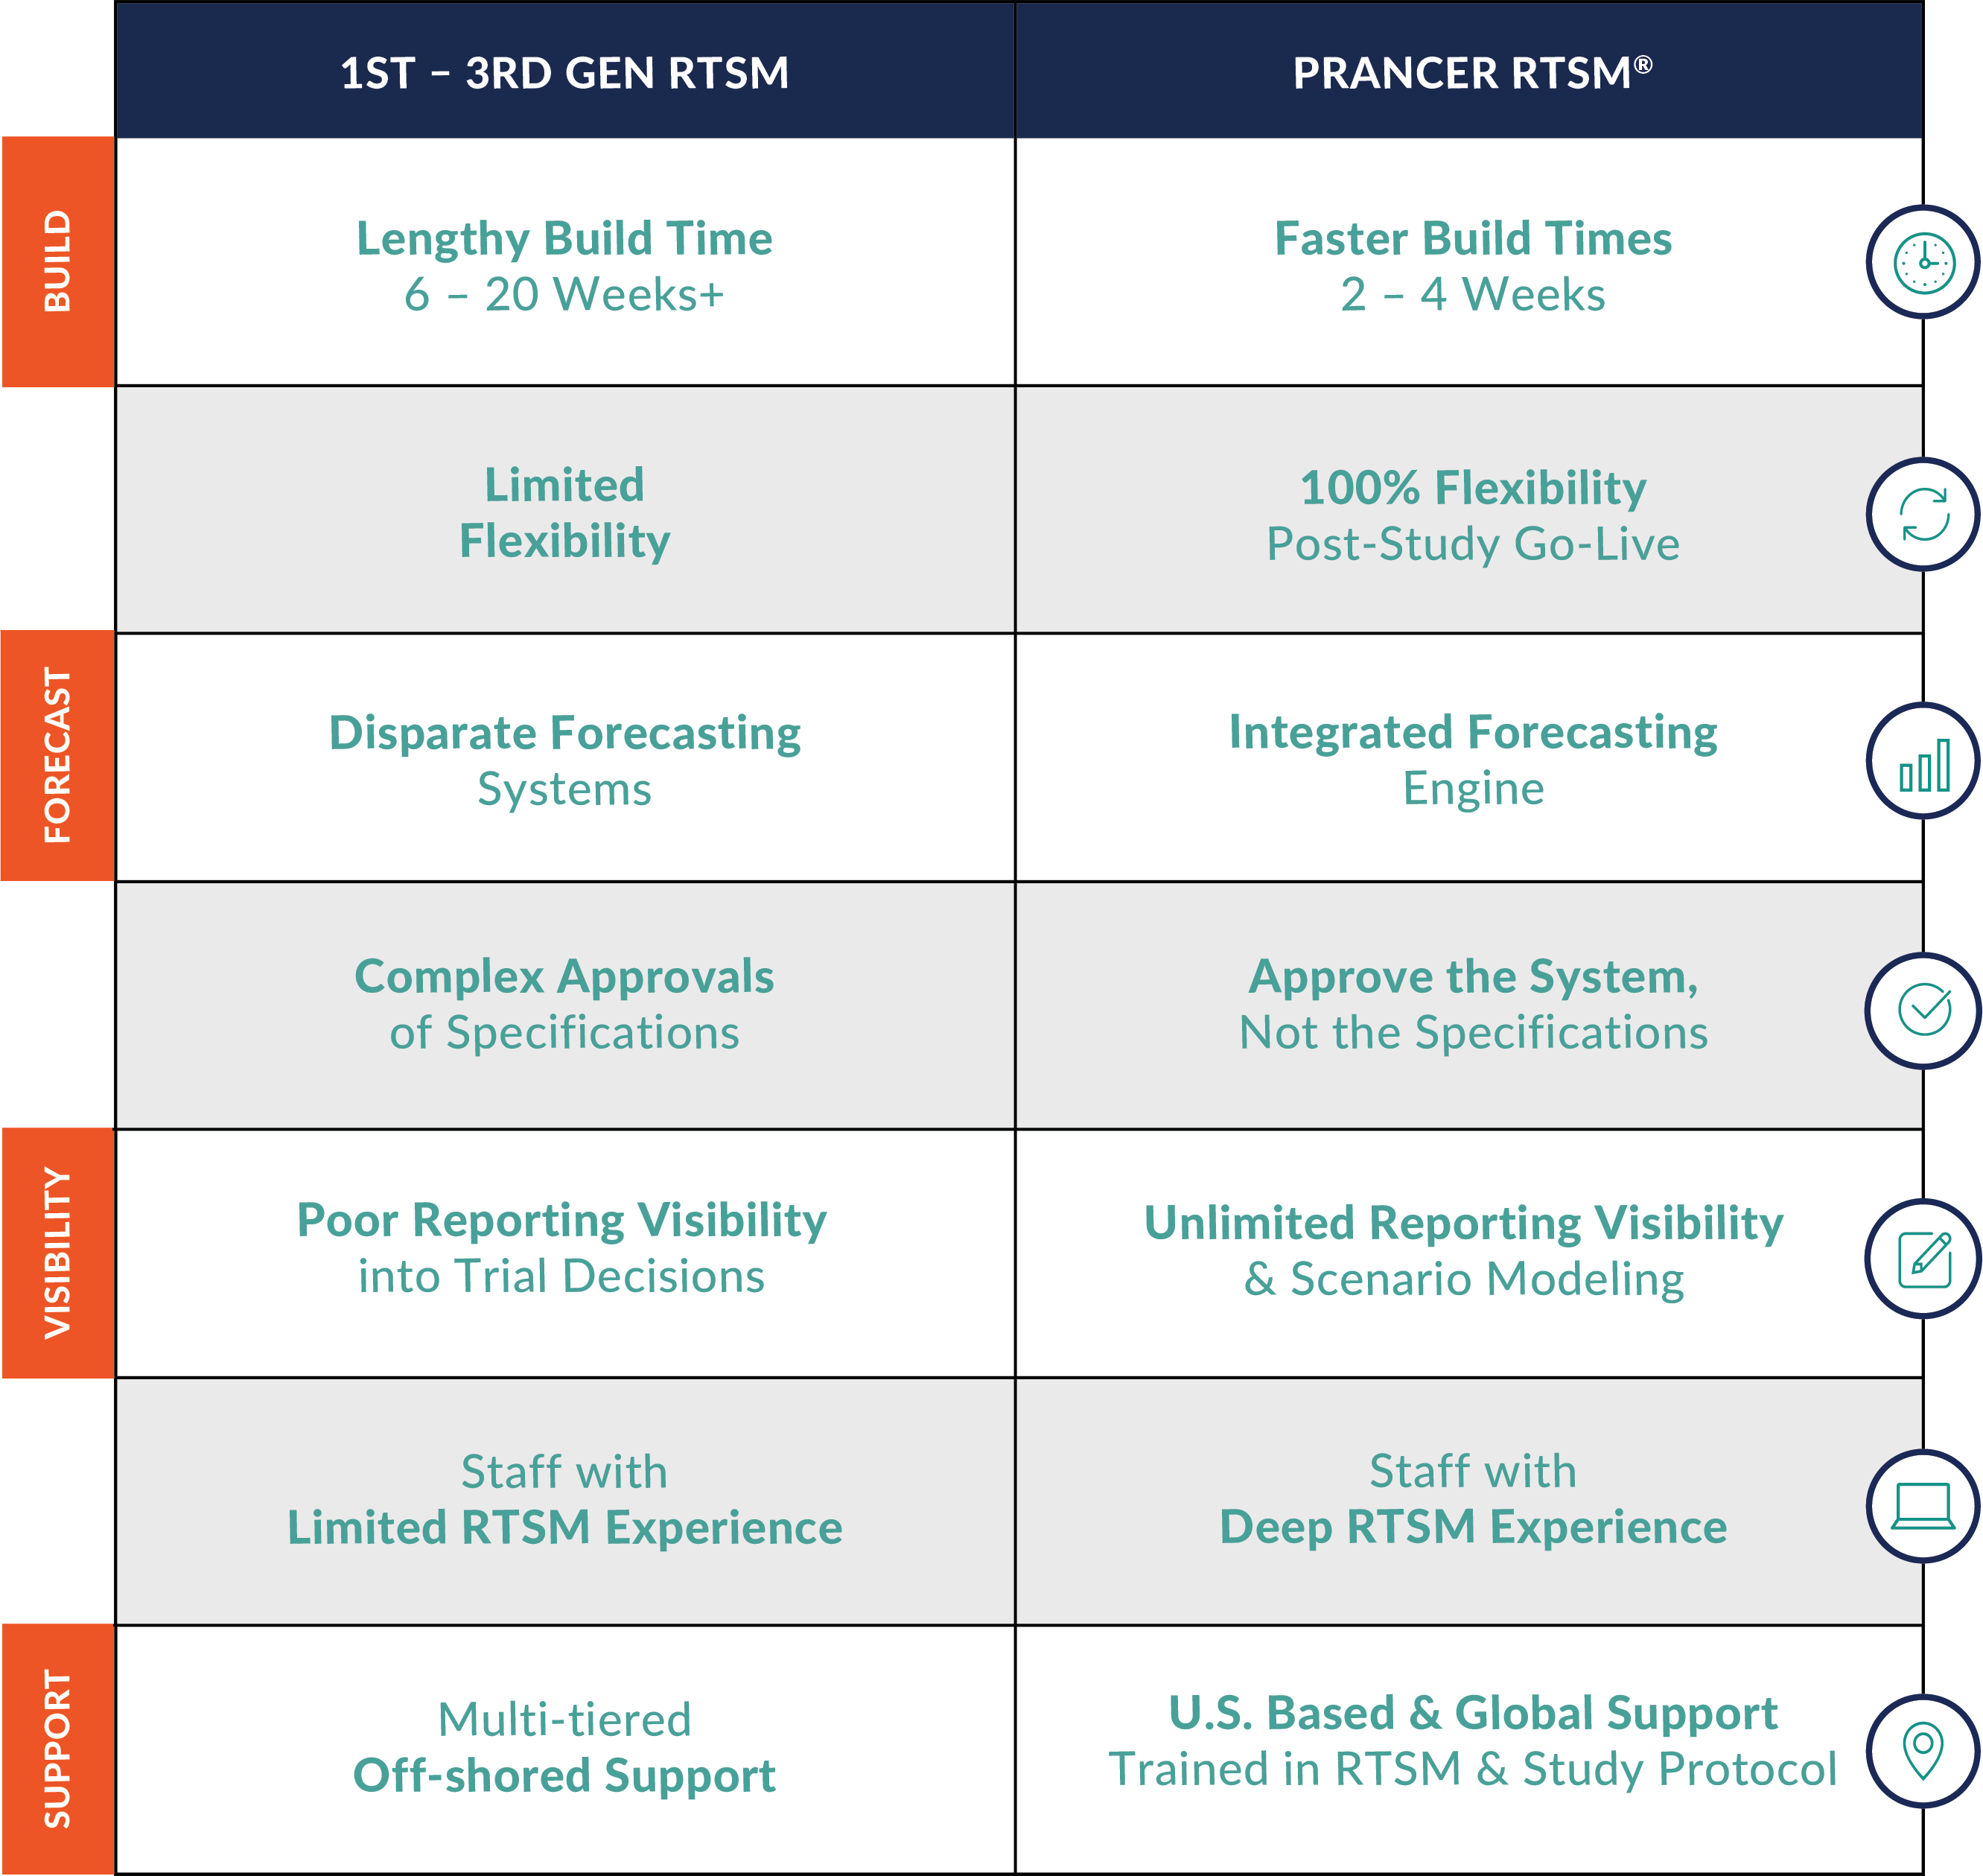 prancer-rtsm-technology-chart (2)